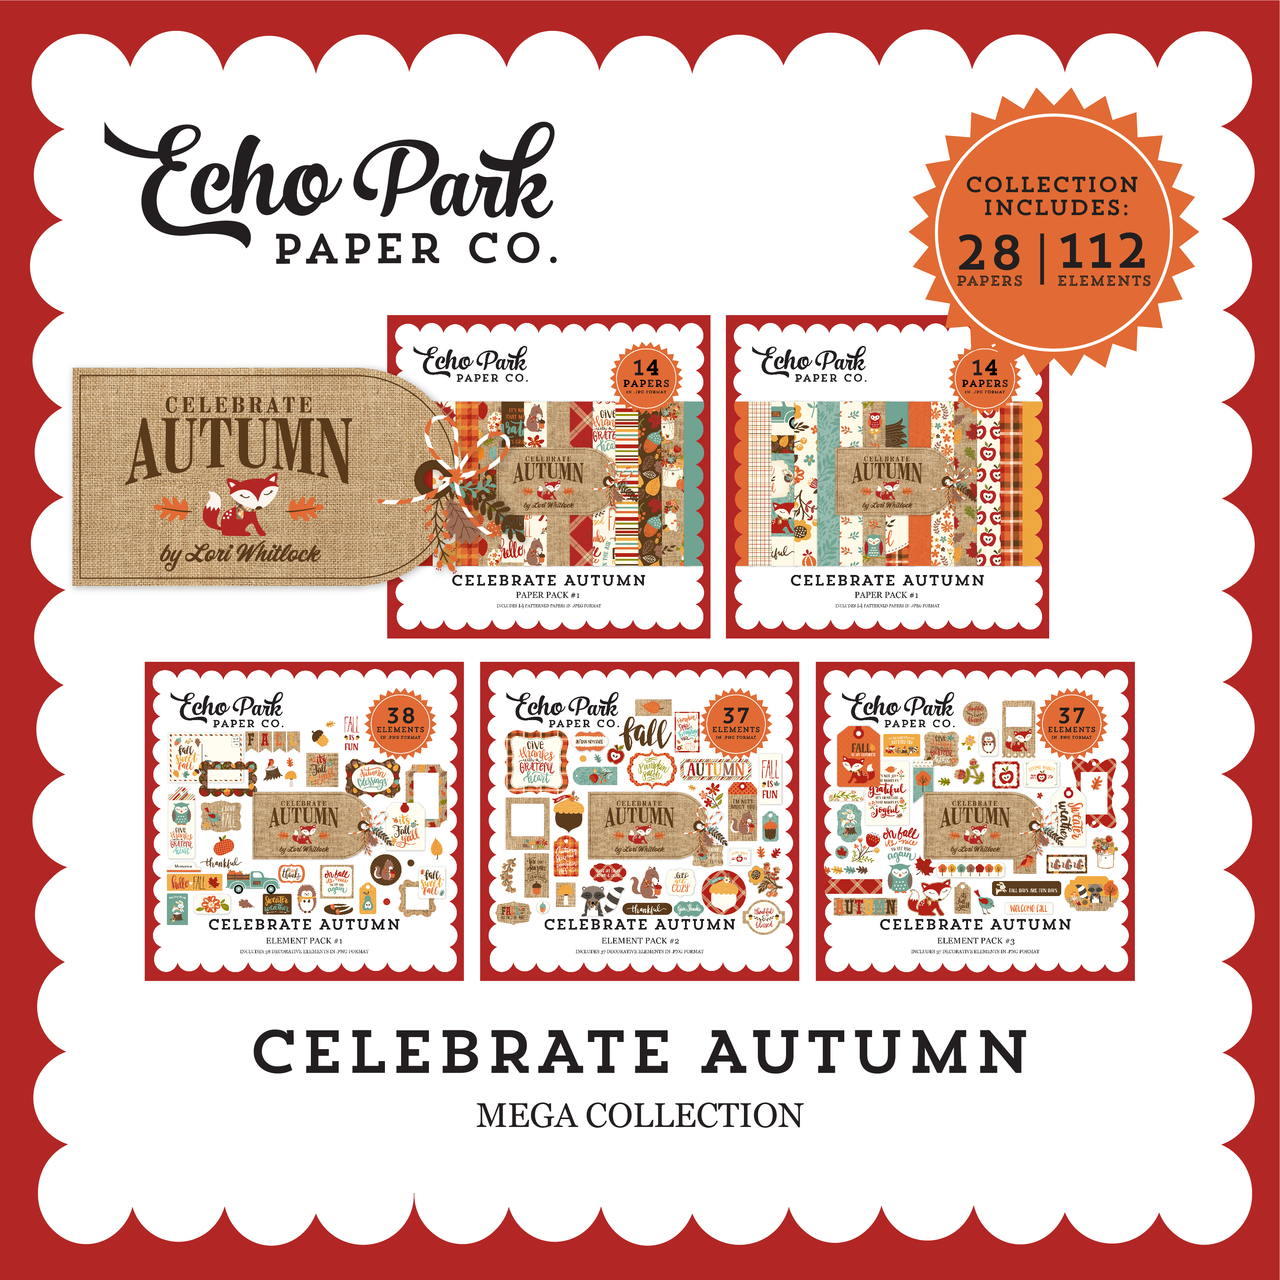 Celebrate Autumn Mega Collection